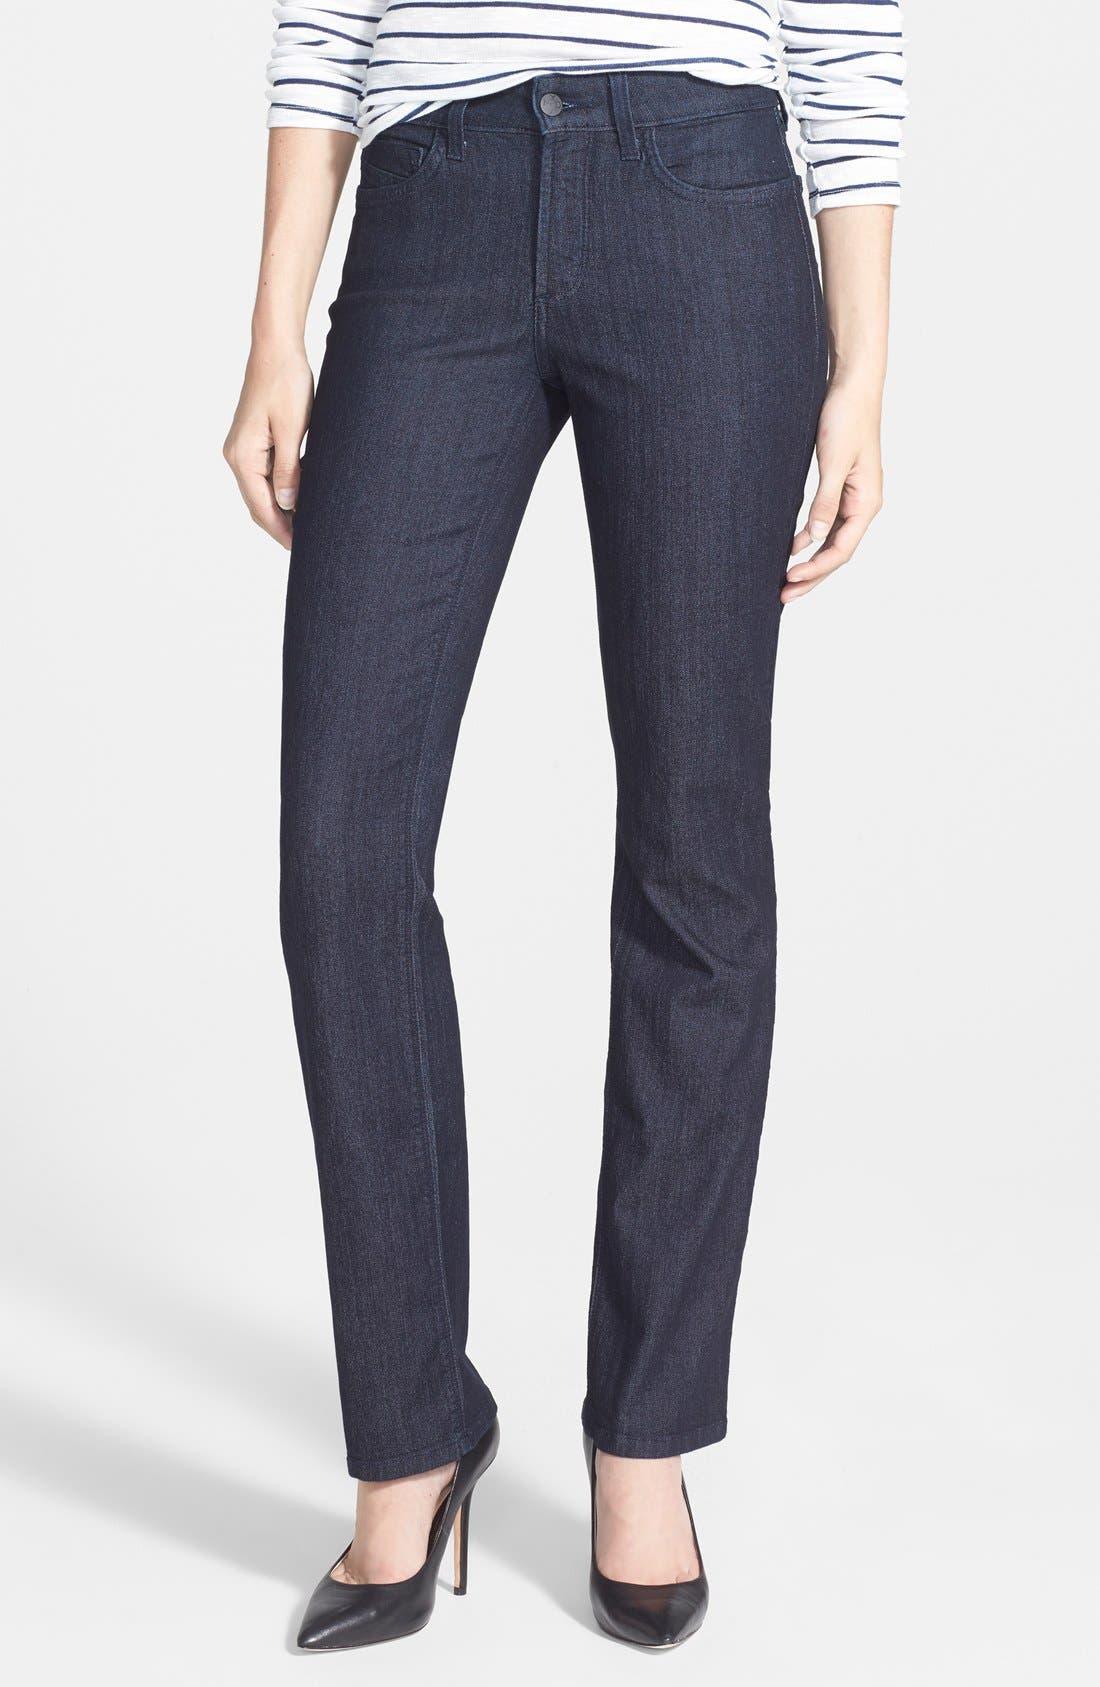 'Marilyn' Stretch Straight Leg Jeans,                         Main,                         color, Dark Enzyme Wash